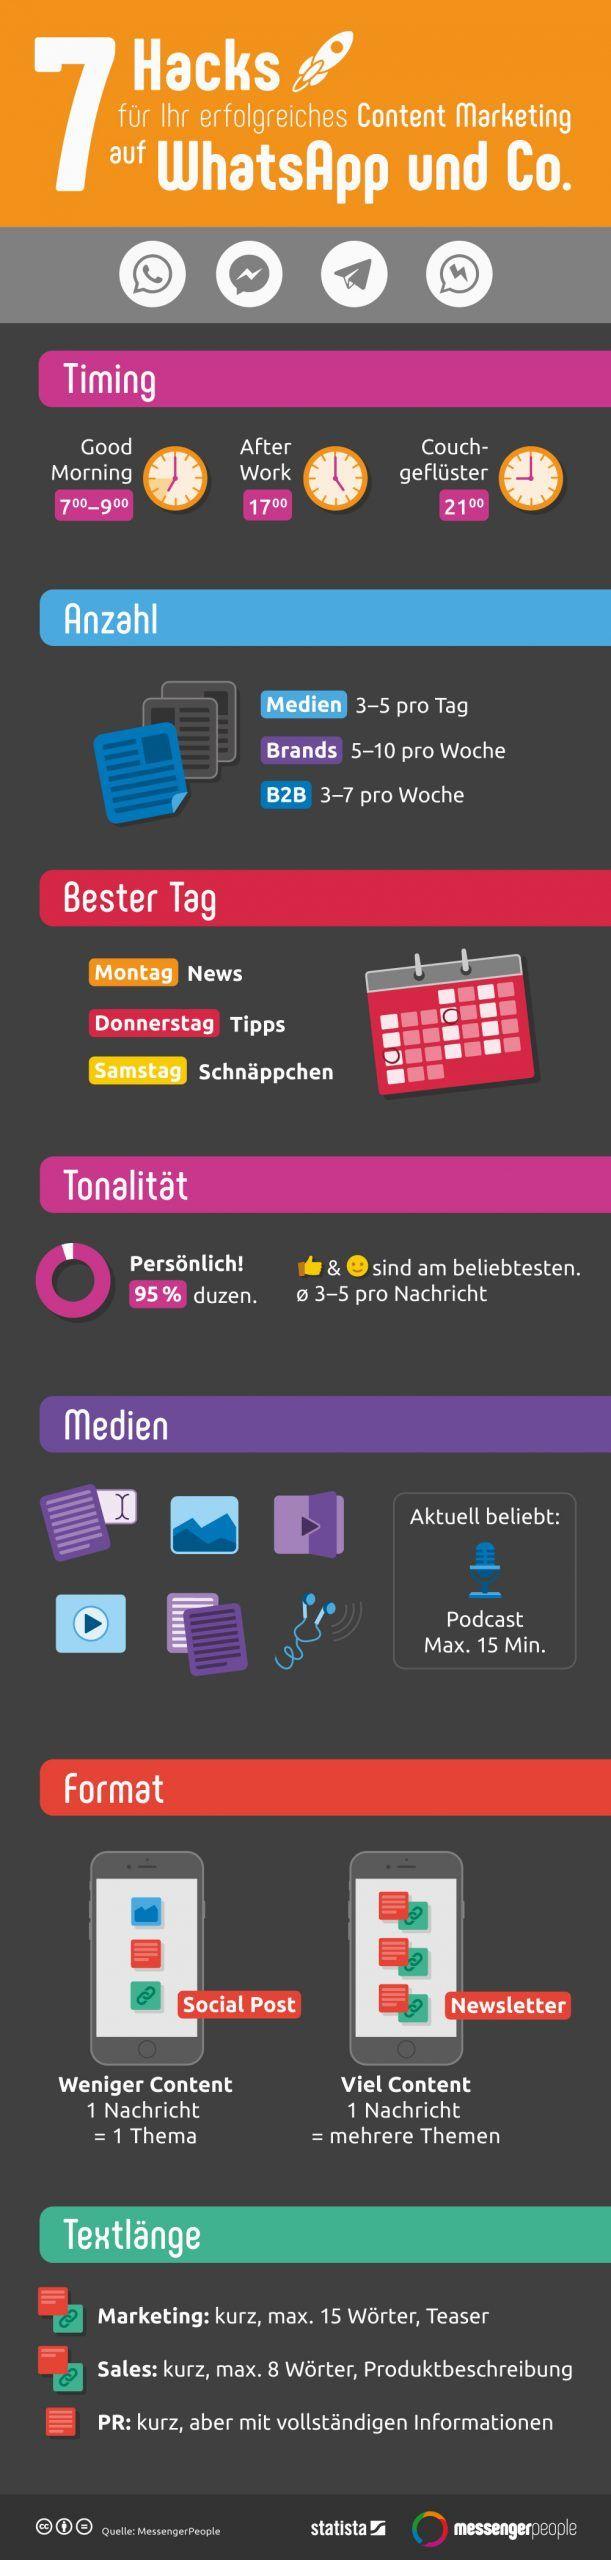 Infografik MessengerPeople Content Marketing